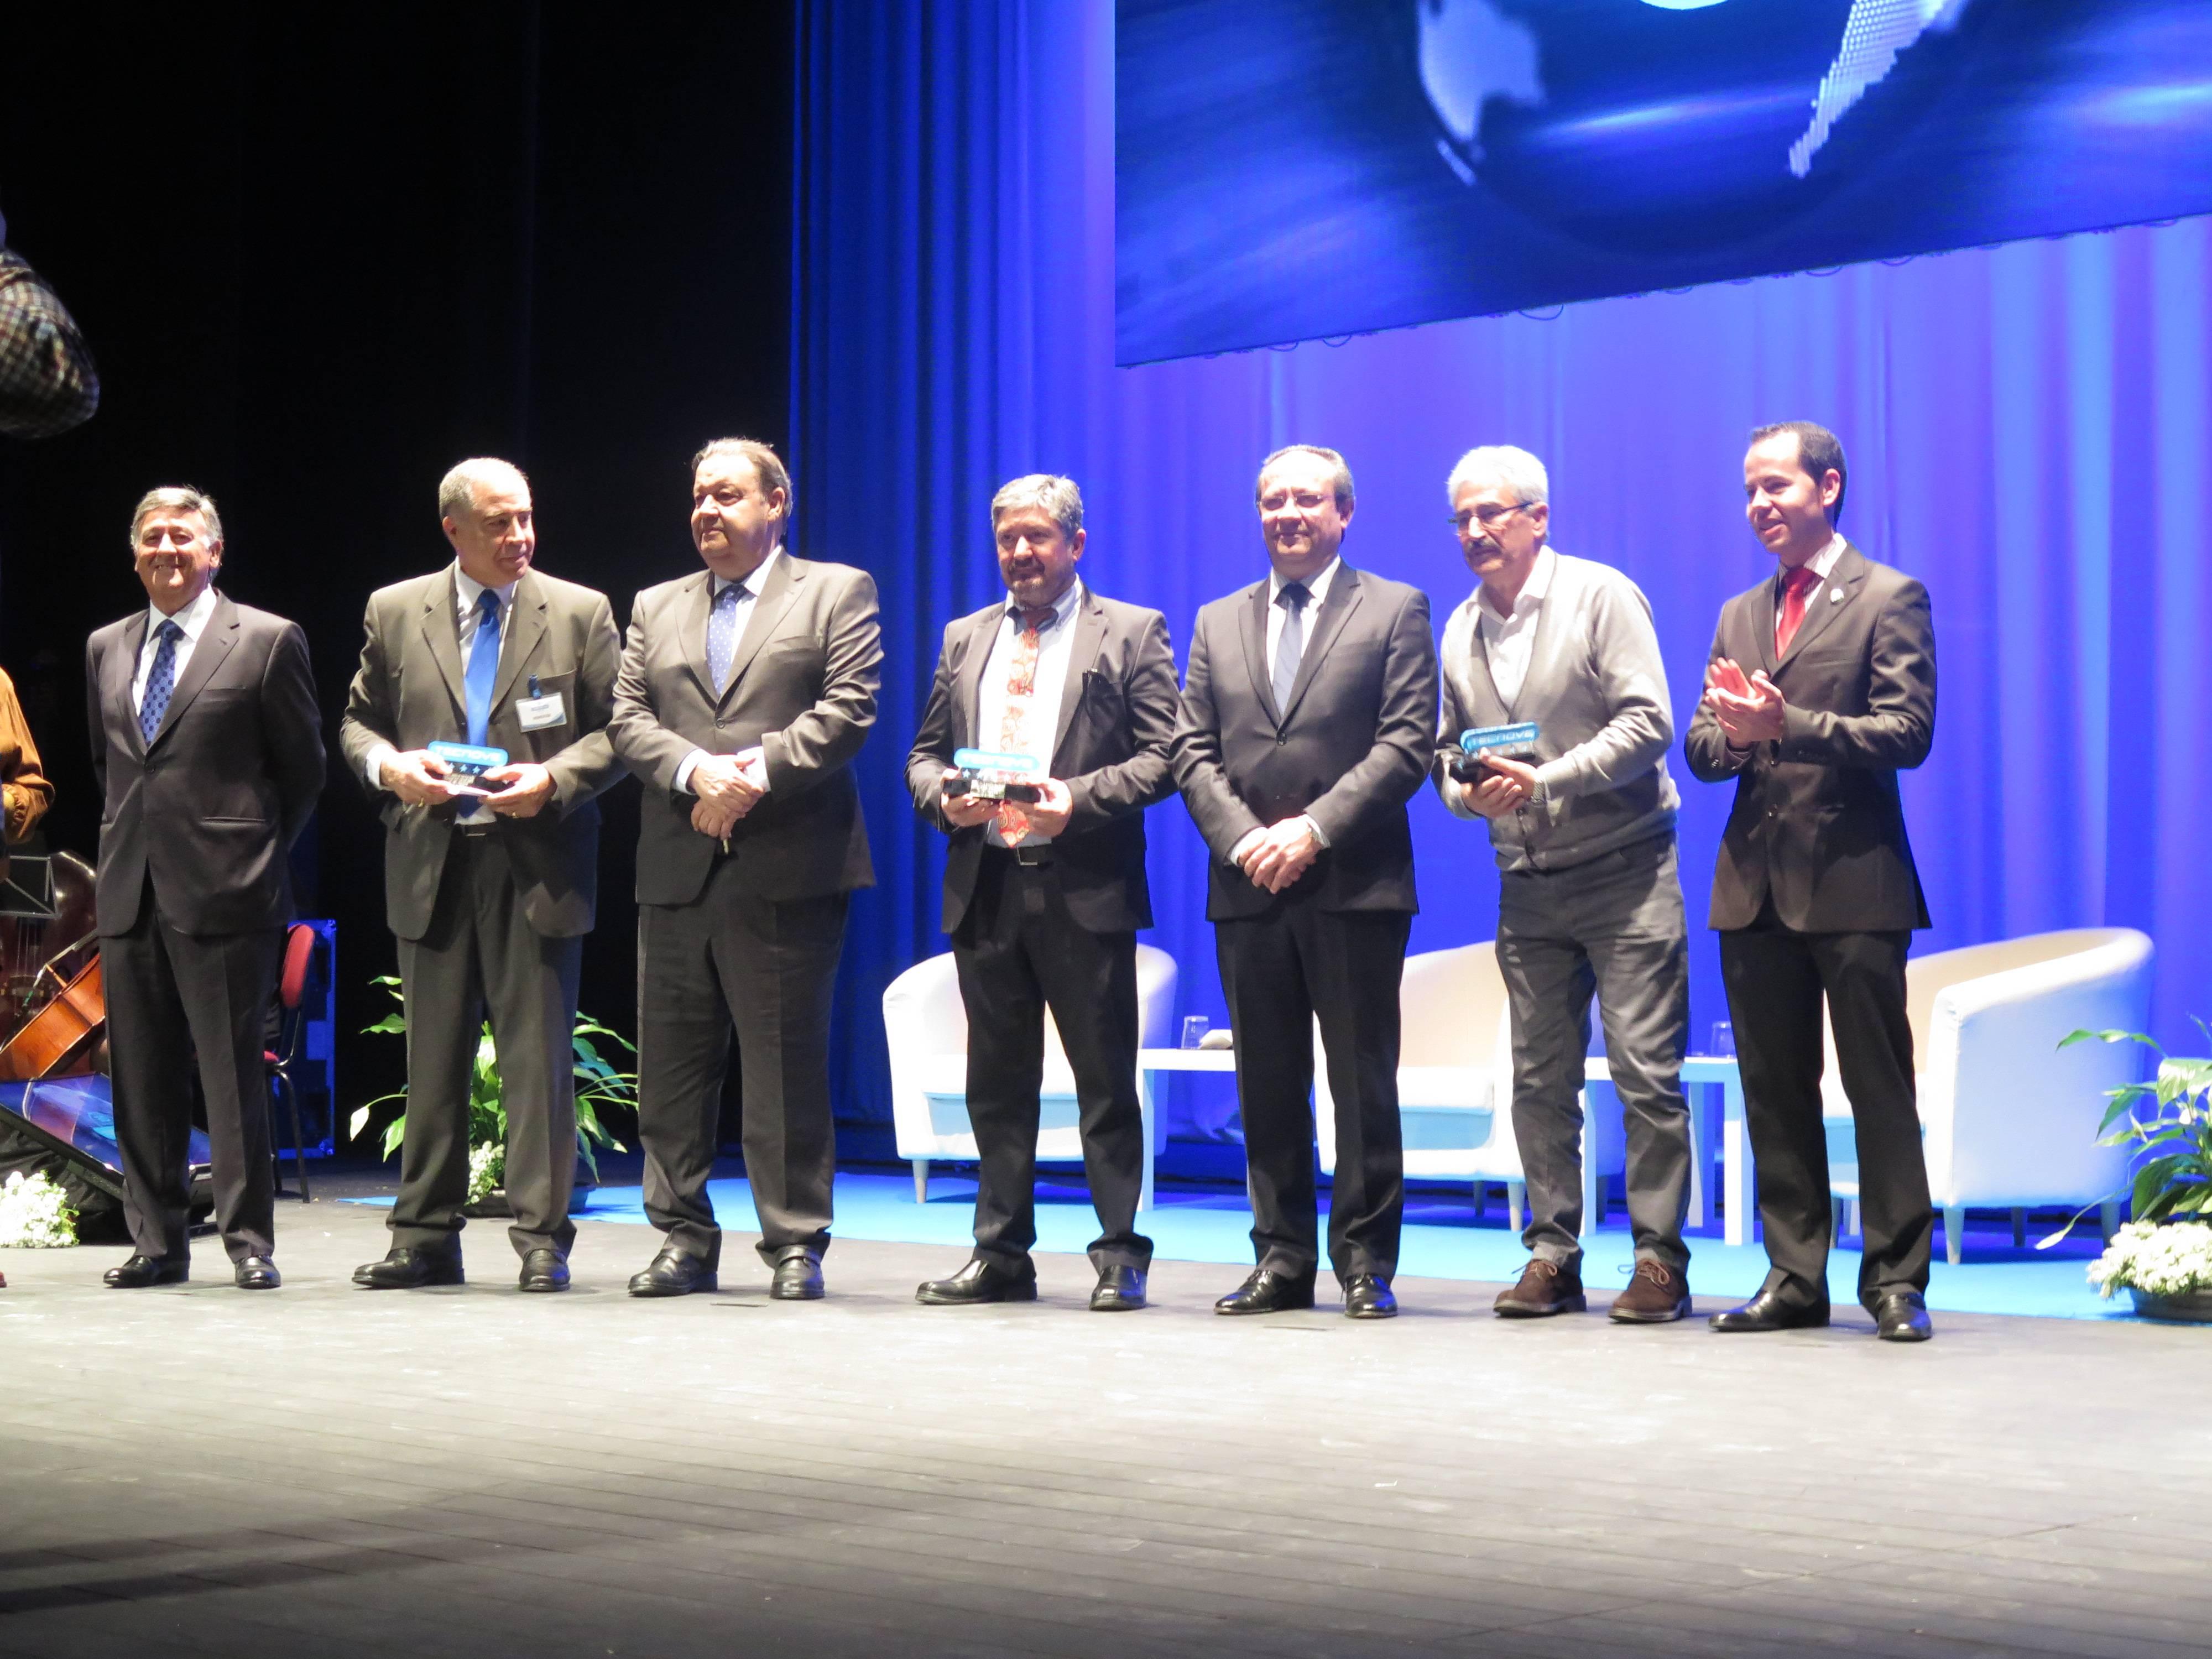 30 aniversario de Tecnove en Herencia